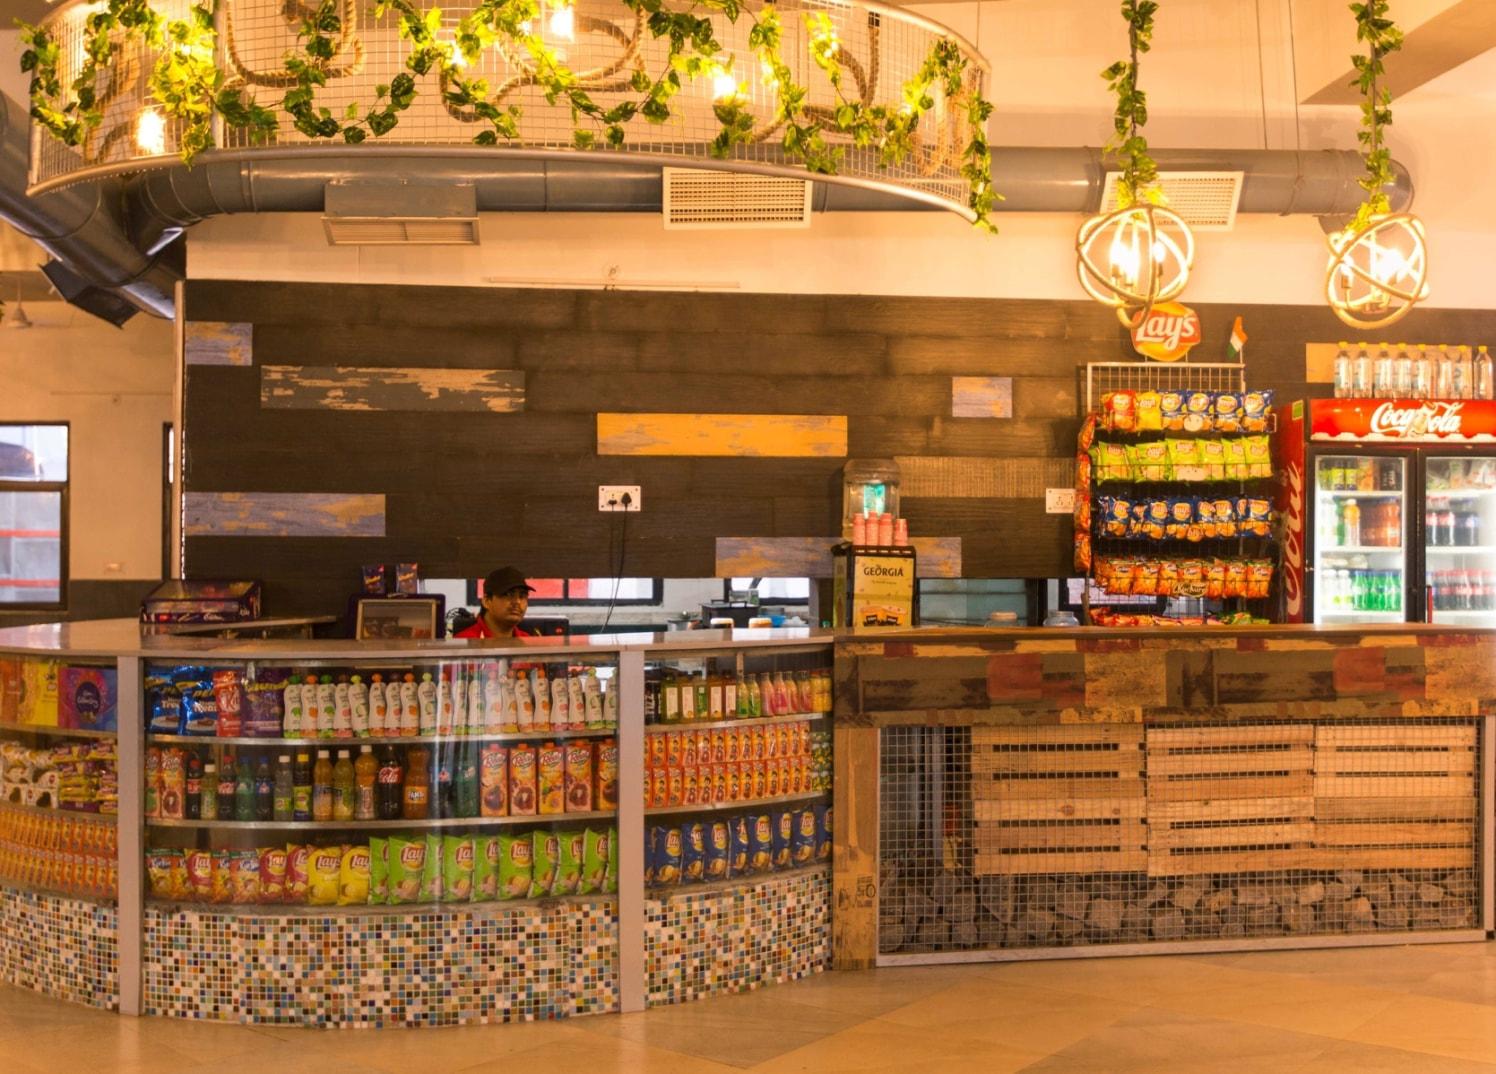 Awesome Restaurant  Reception by Swati Jain Contemporary | Interior Design Photos & Ideas